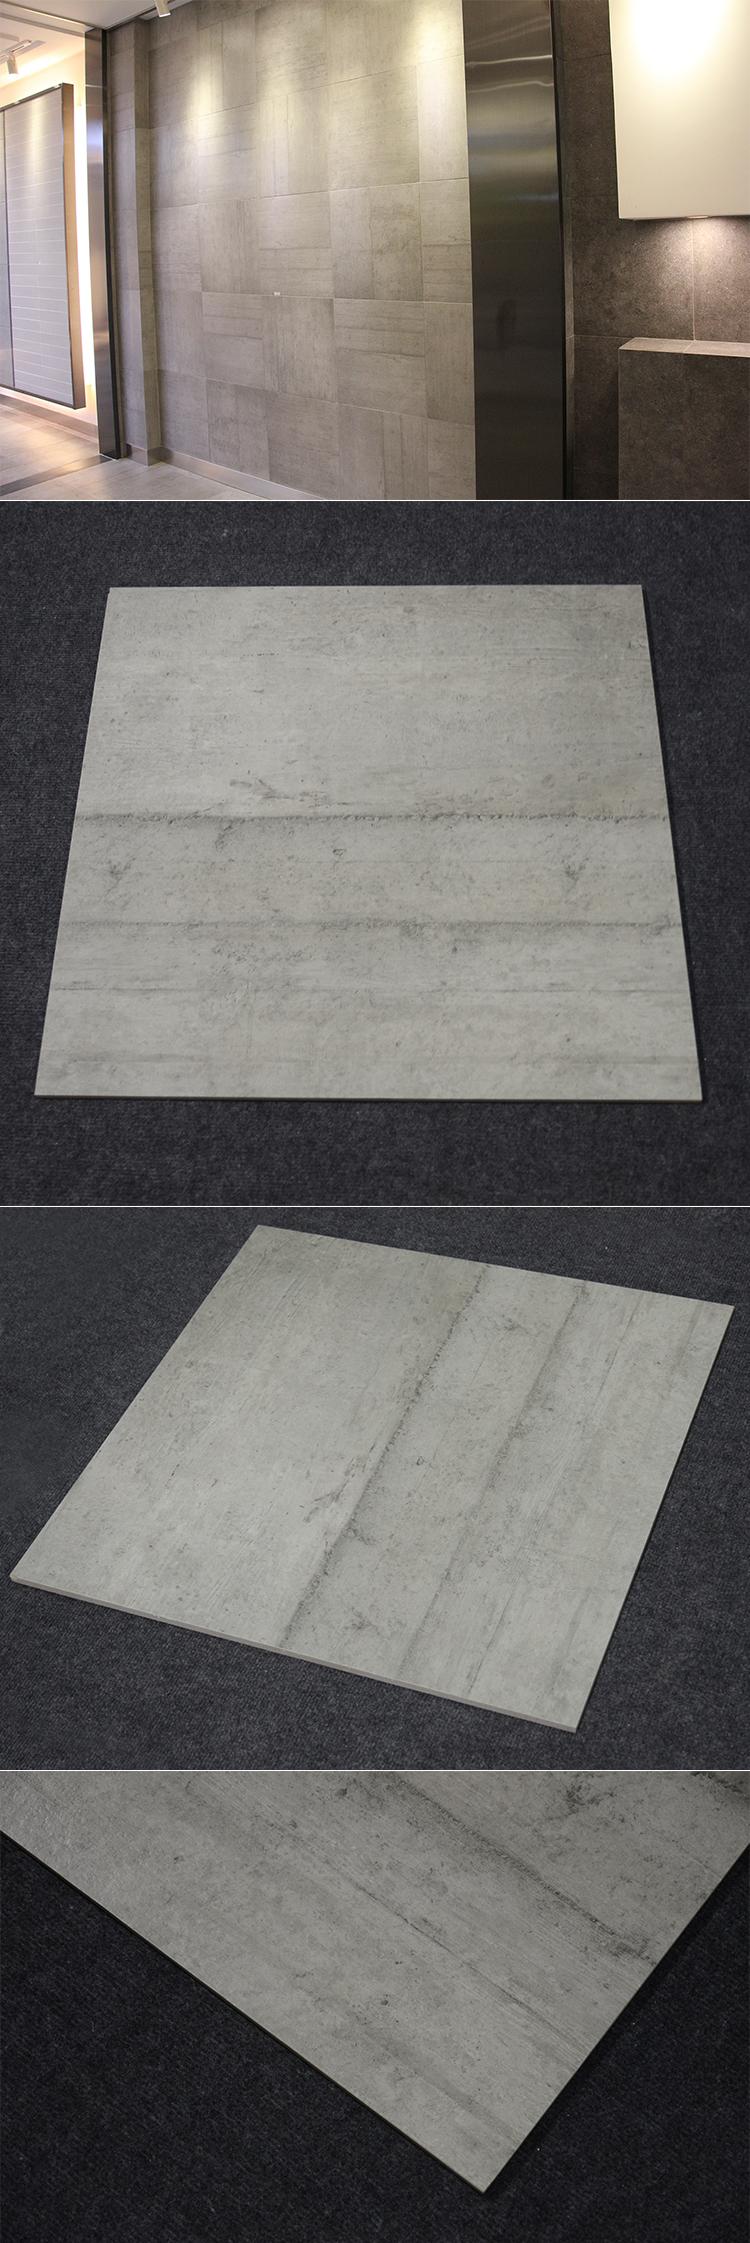 Hcm6008 interlocking ceramic tile floors manufacturer malaysia from hcm6008 interlocking ceramic tile floors manufacturer malaysia from brazil dailygadgetfo Gallery